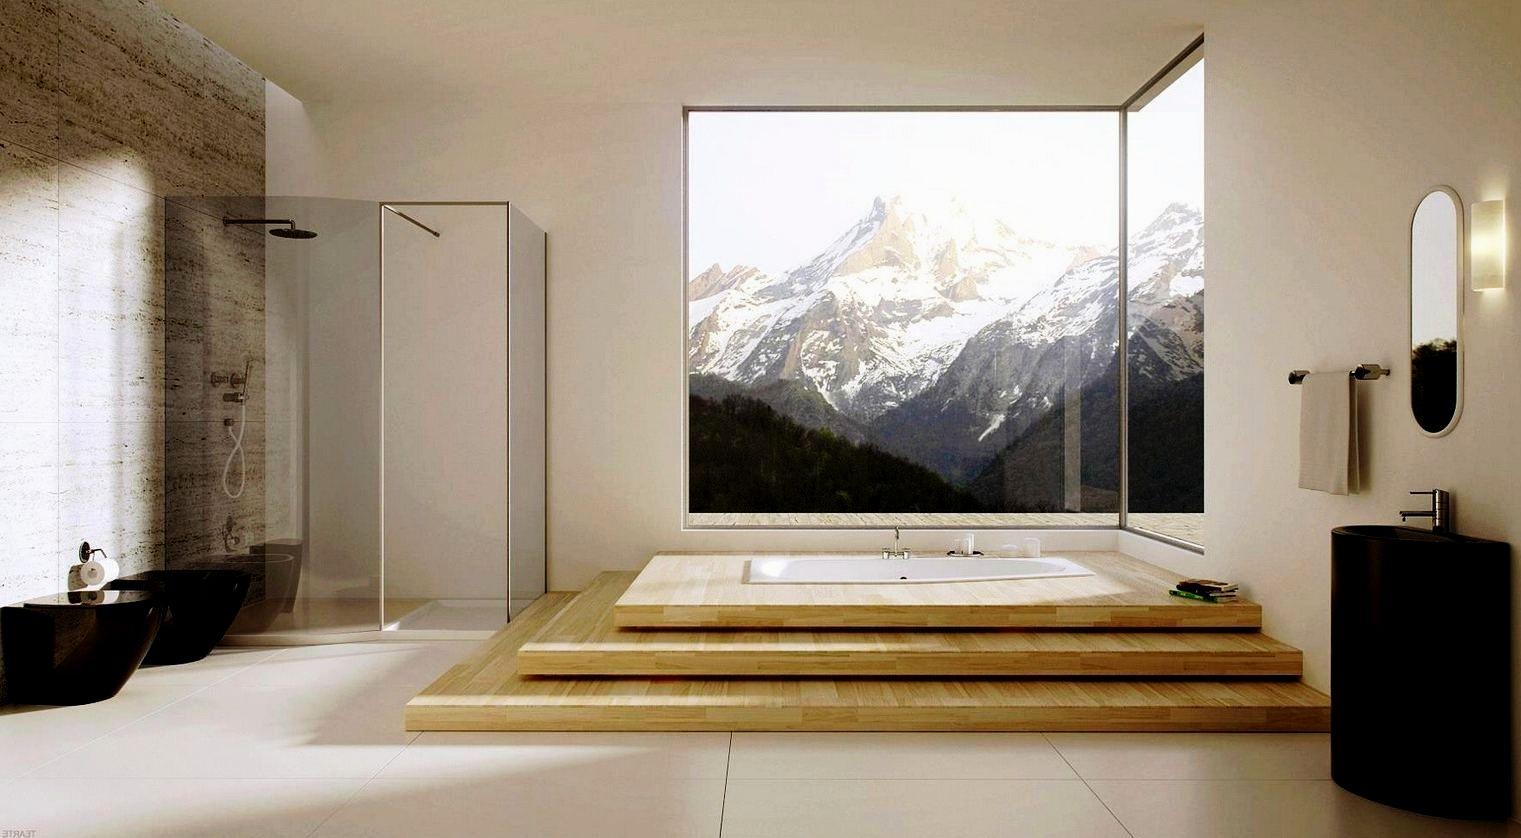 superb bathroom decoration ideas pattern-New Bathroom Decoration Ideas Design